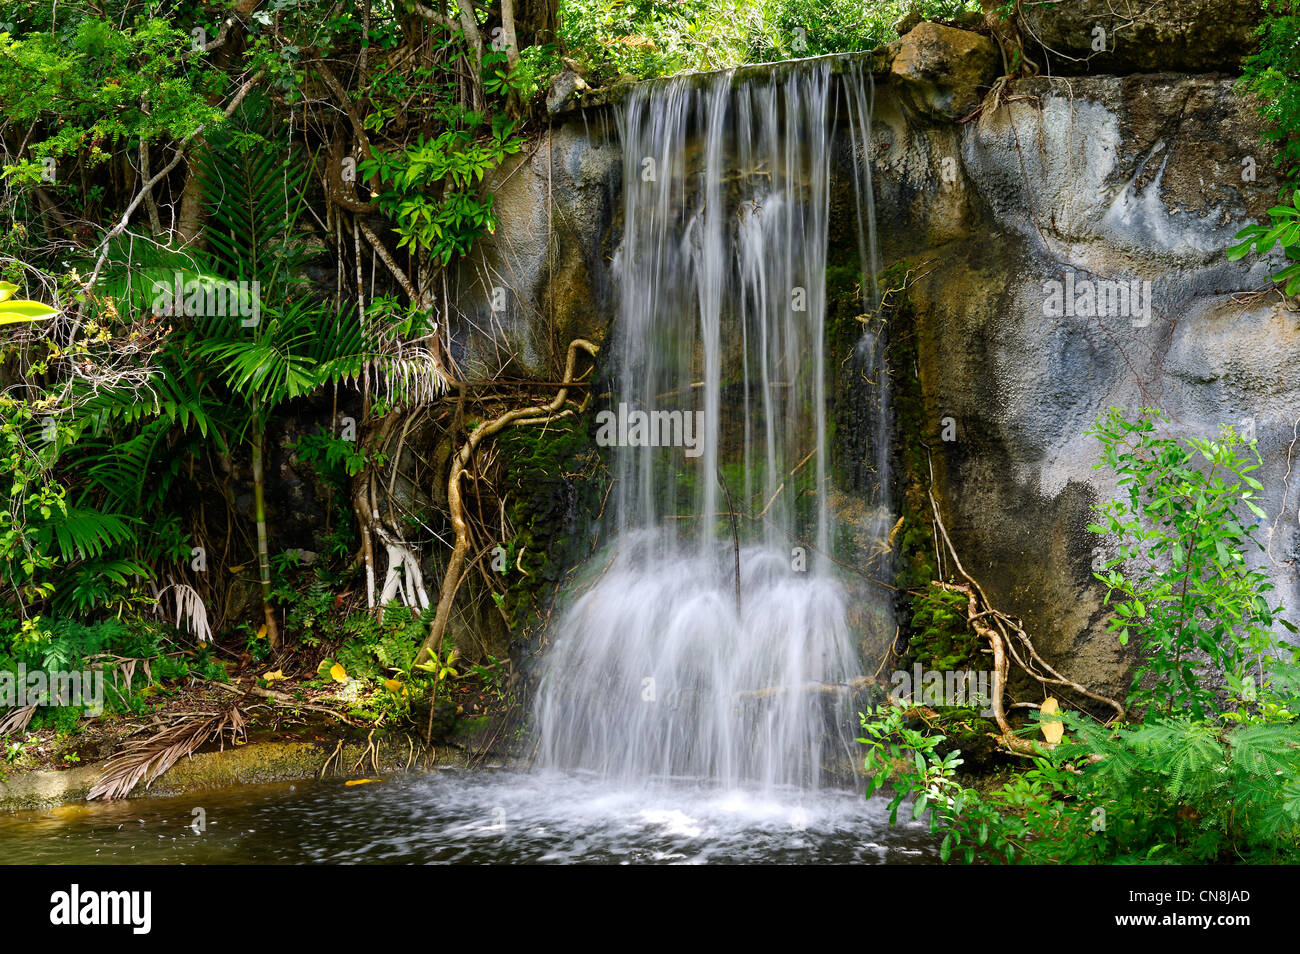 Bahamas, Grand Bahama Island, Freeport, botanical garden, waterfall - Stock Image